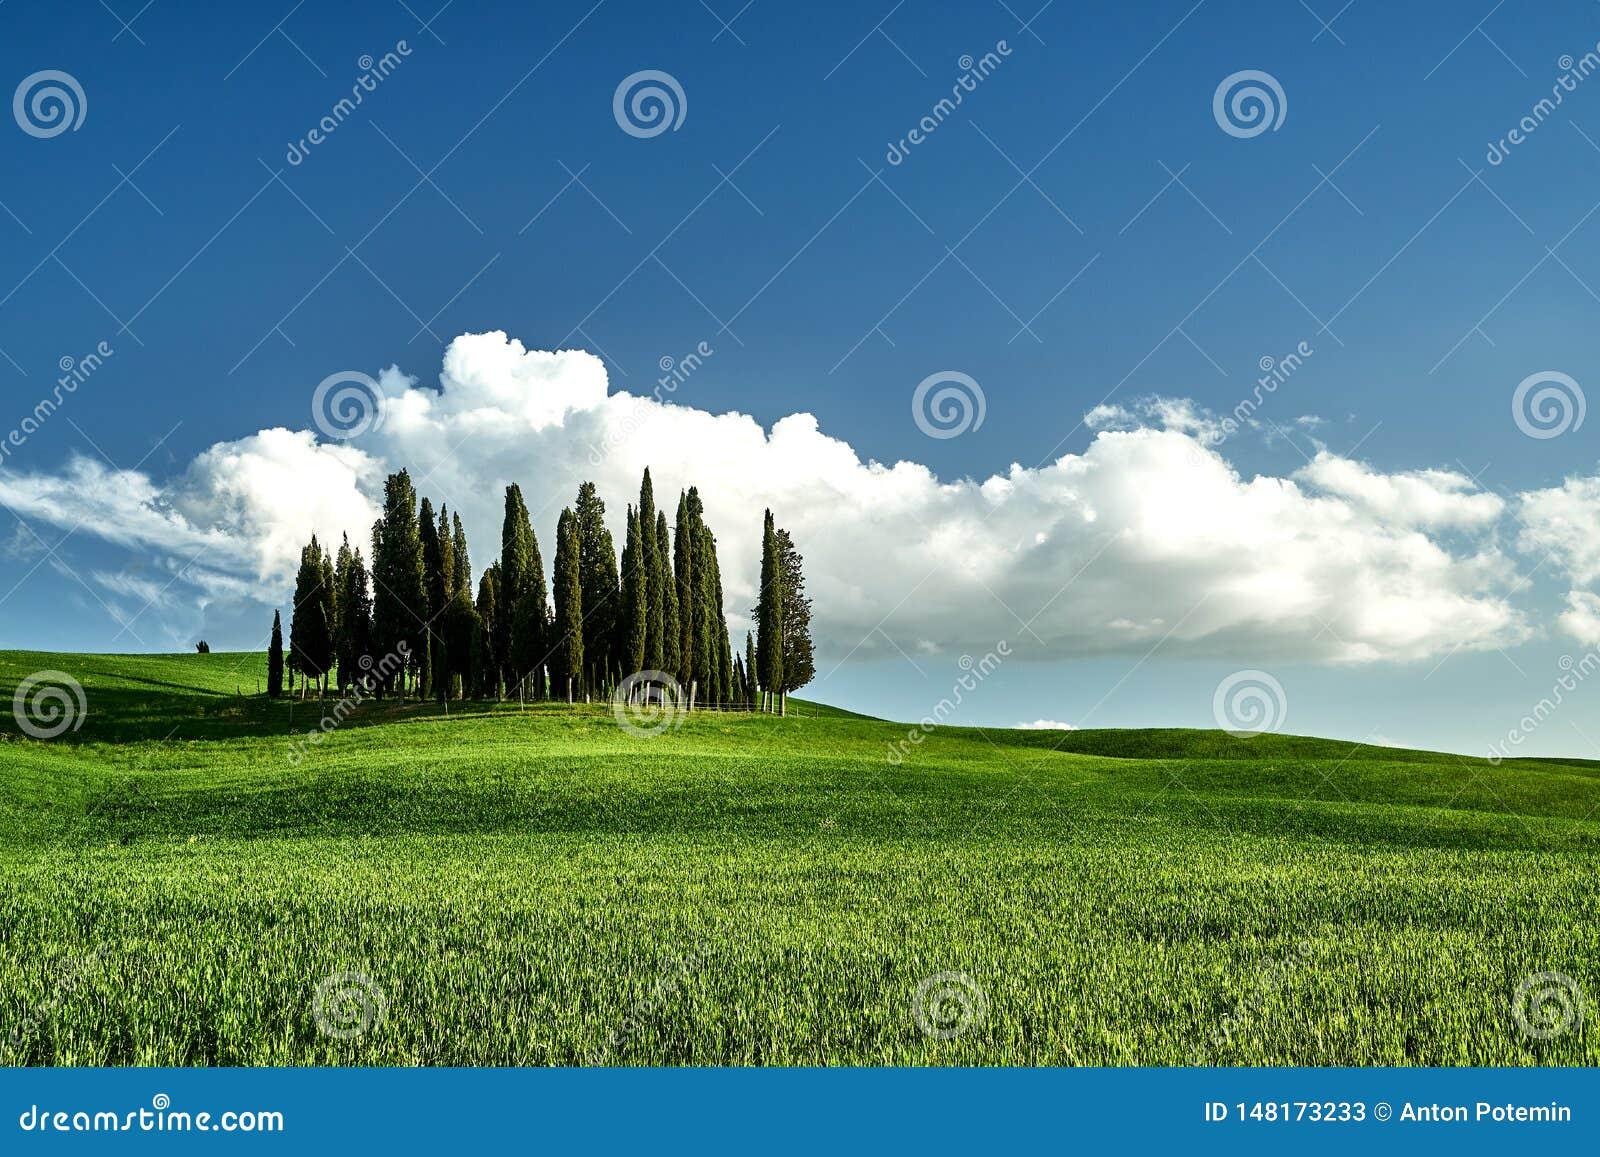 Amazing Tuscany landscape. Green grass, blue sky, cypress trees